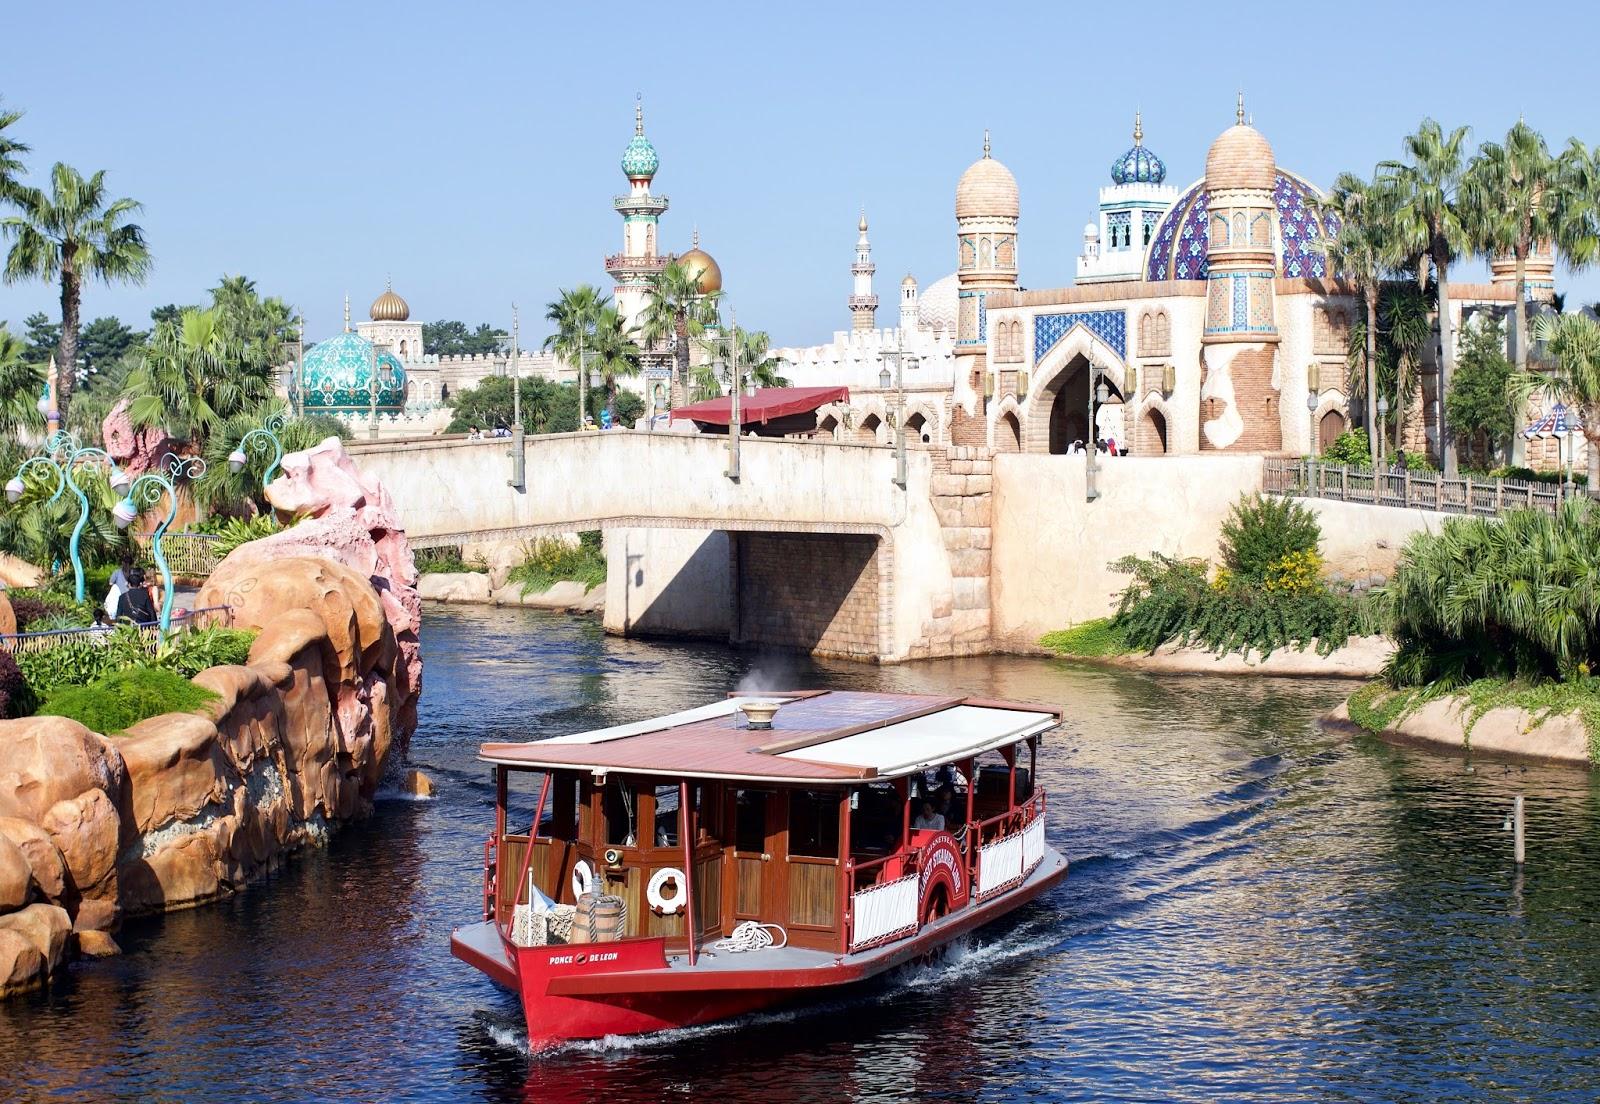 Tokyo-Disney-Sea-Arabian-coast-boat